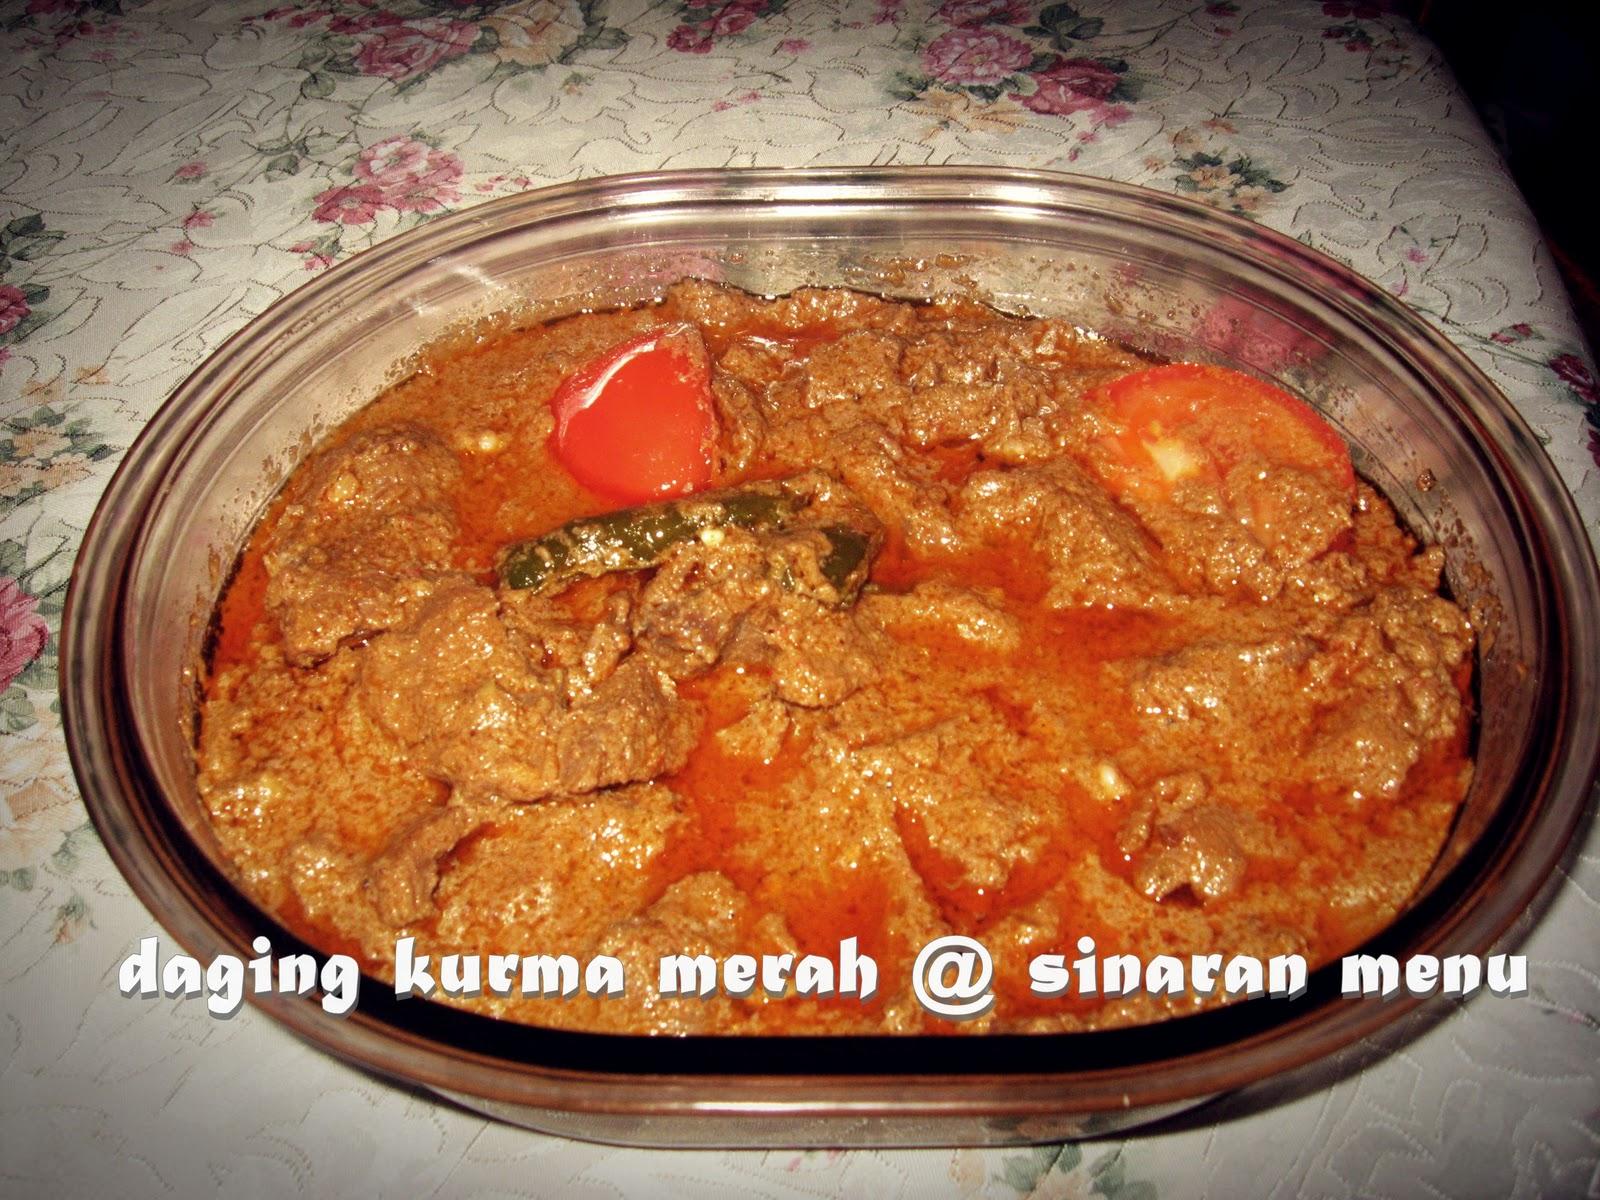 resepi daging masak kurma resepi kurma daging   sedap  mudah disediakan dakirsty Resepi Kari Daging Tanpa Santan Enak dan Mudah